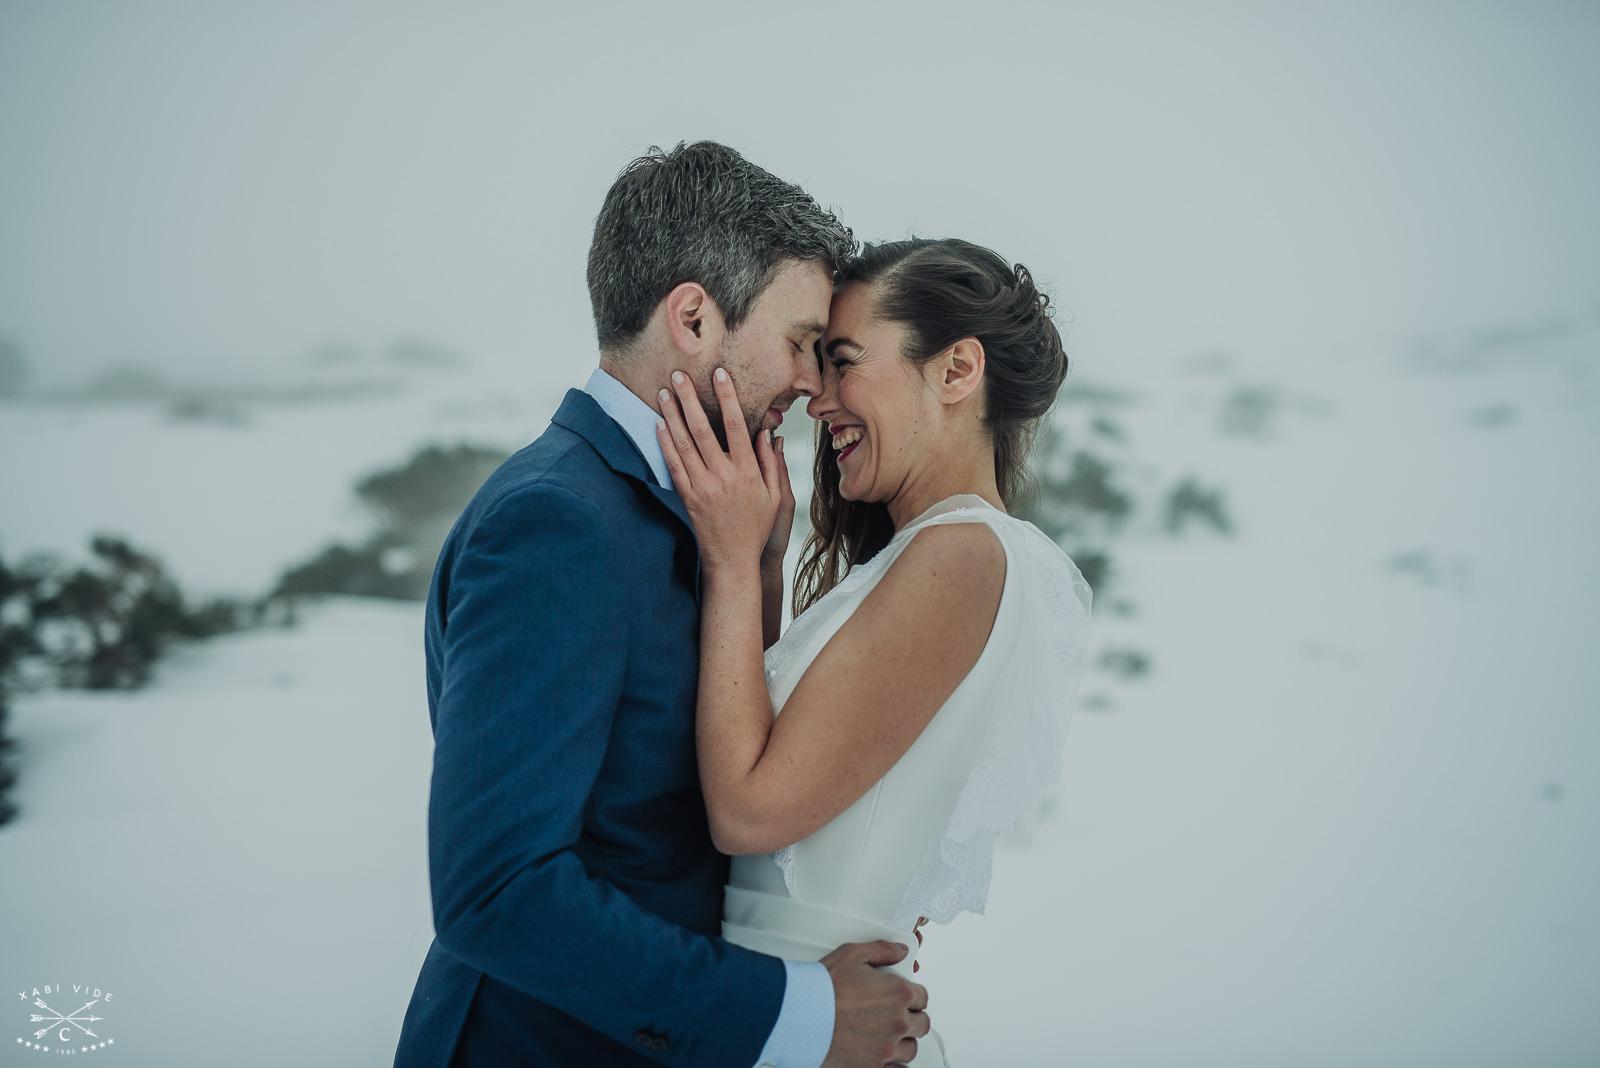 fotógrafo de bodas en bilbao-33